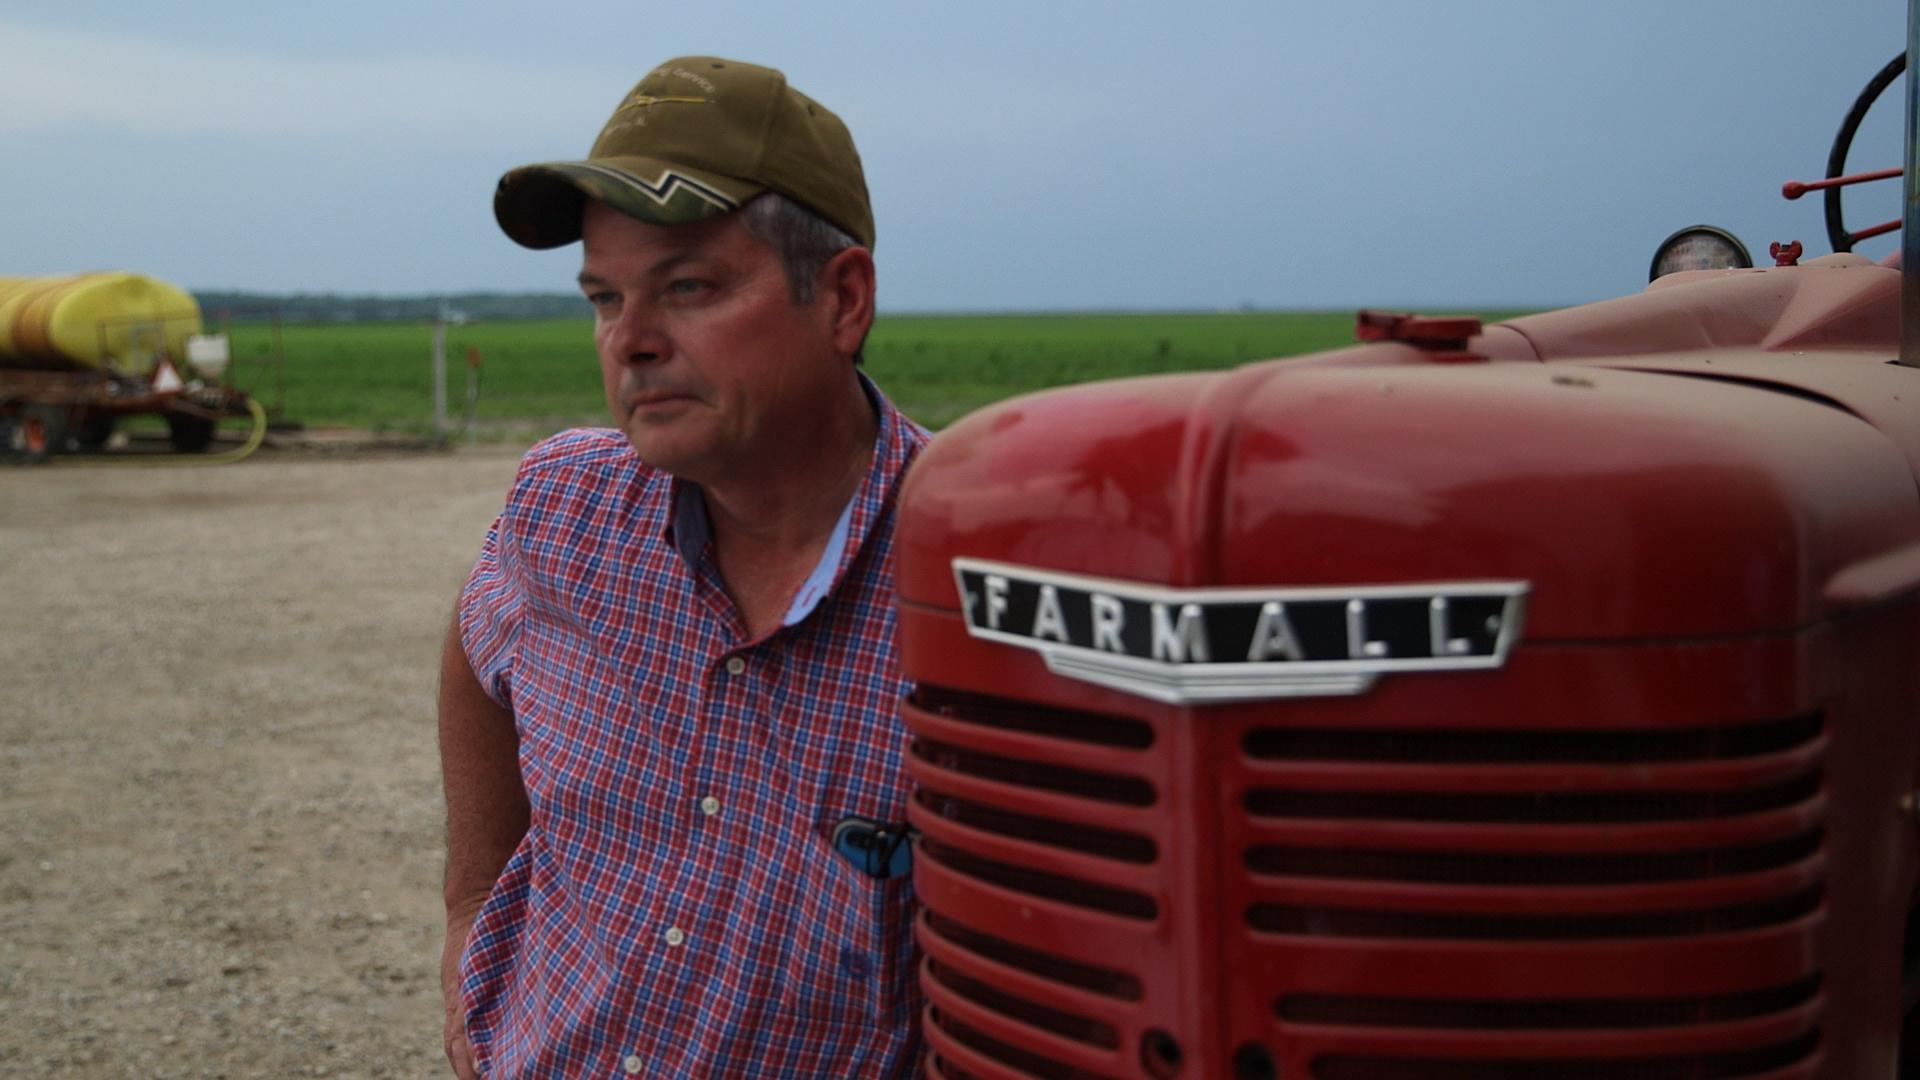 Farmer_Tractor_B4.jpg